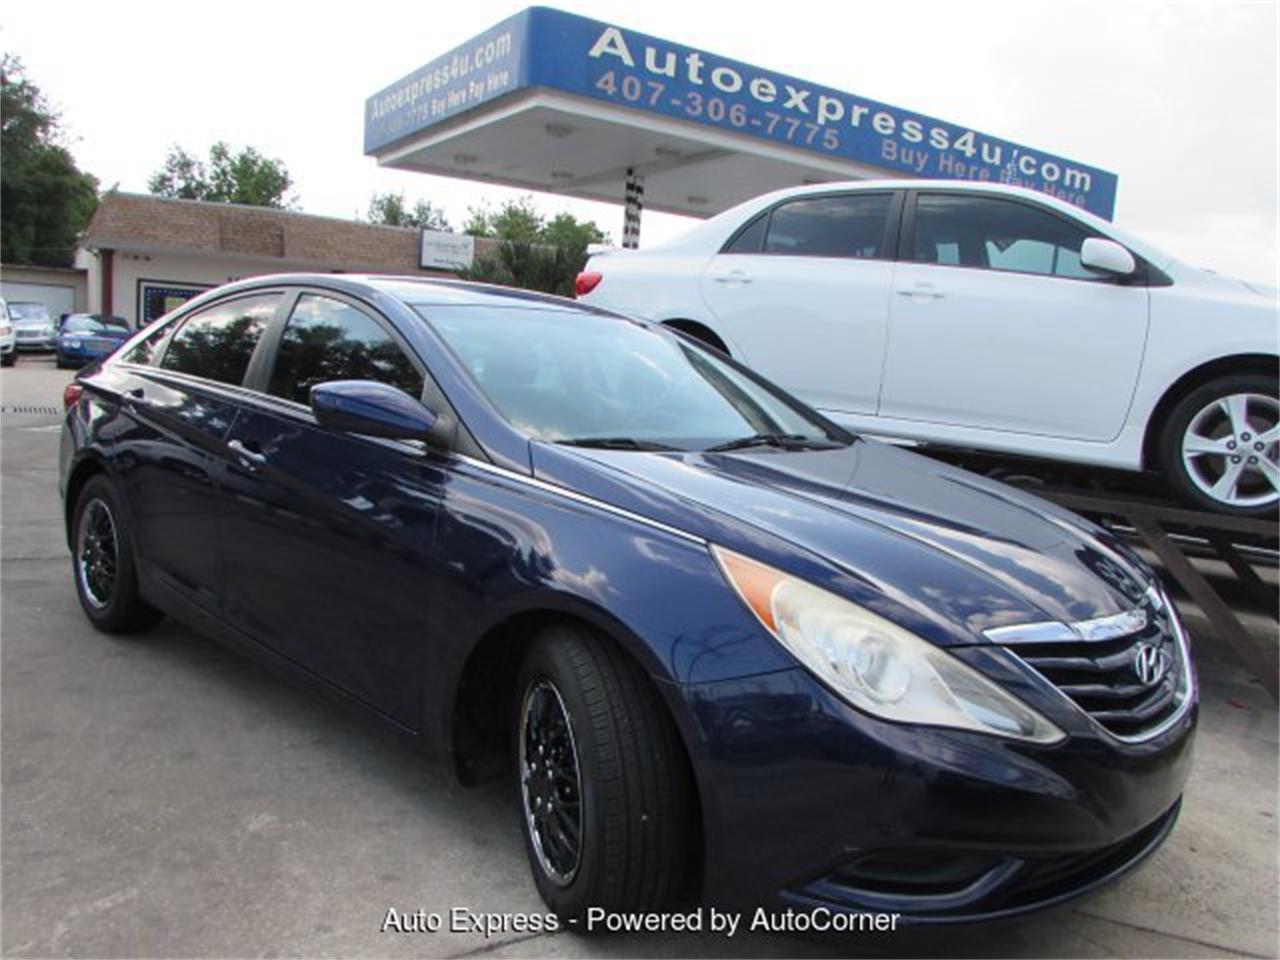 2011 Hyundai Sonata For Sale >> 2011 Hyundai Sonata For Sale Classiccars Com Cc 1207079